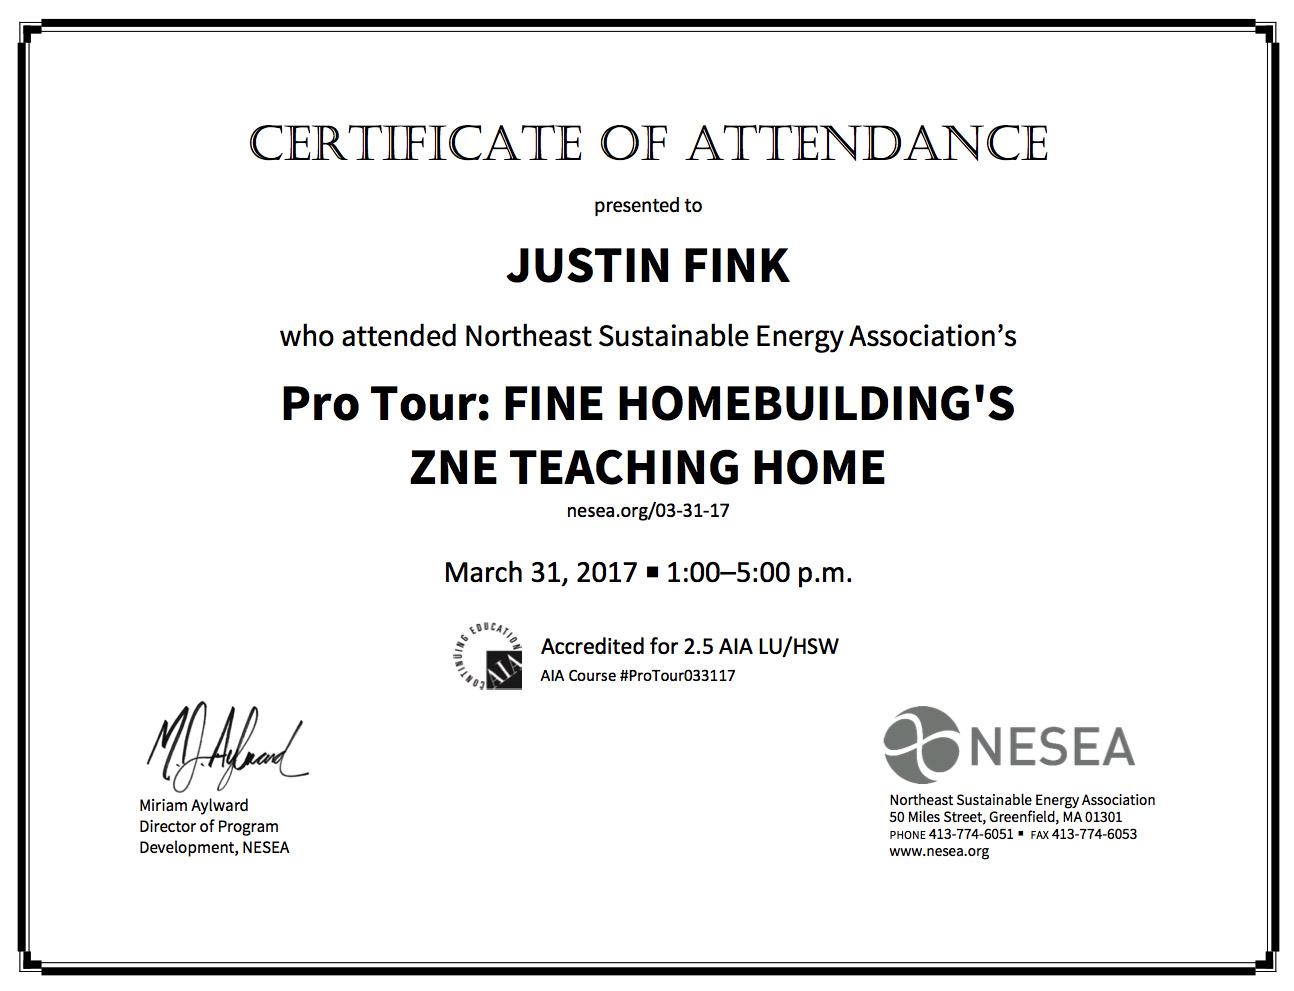 episode 46 u2014 the prohome build as a case study fine homebuilding